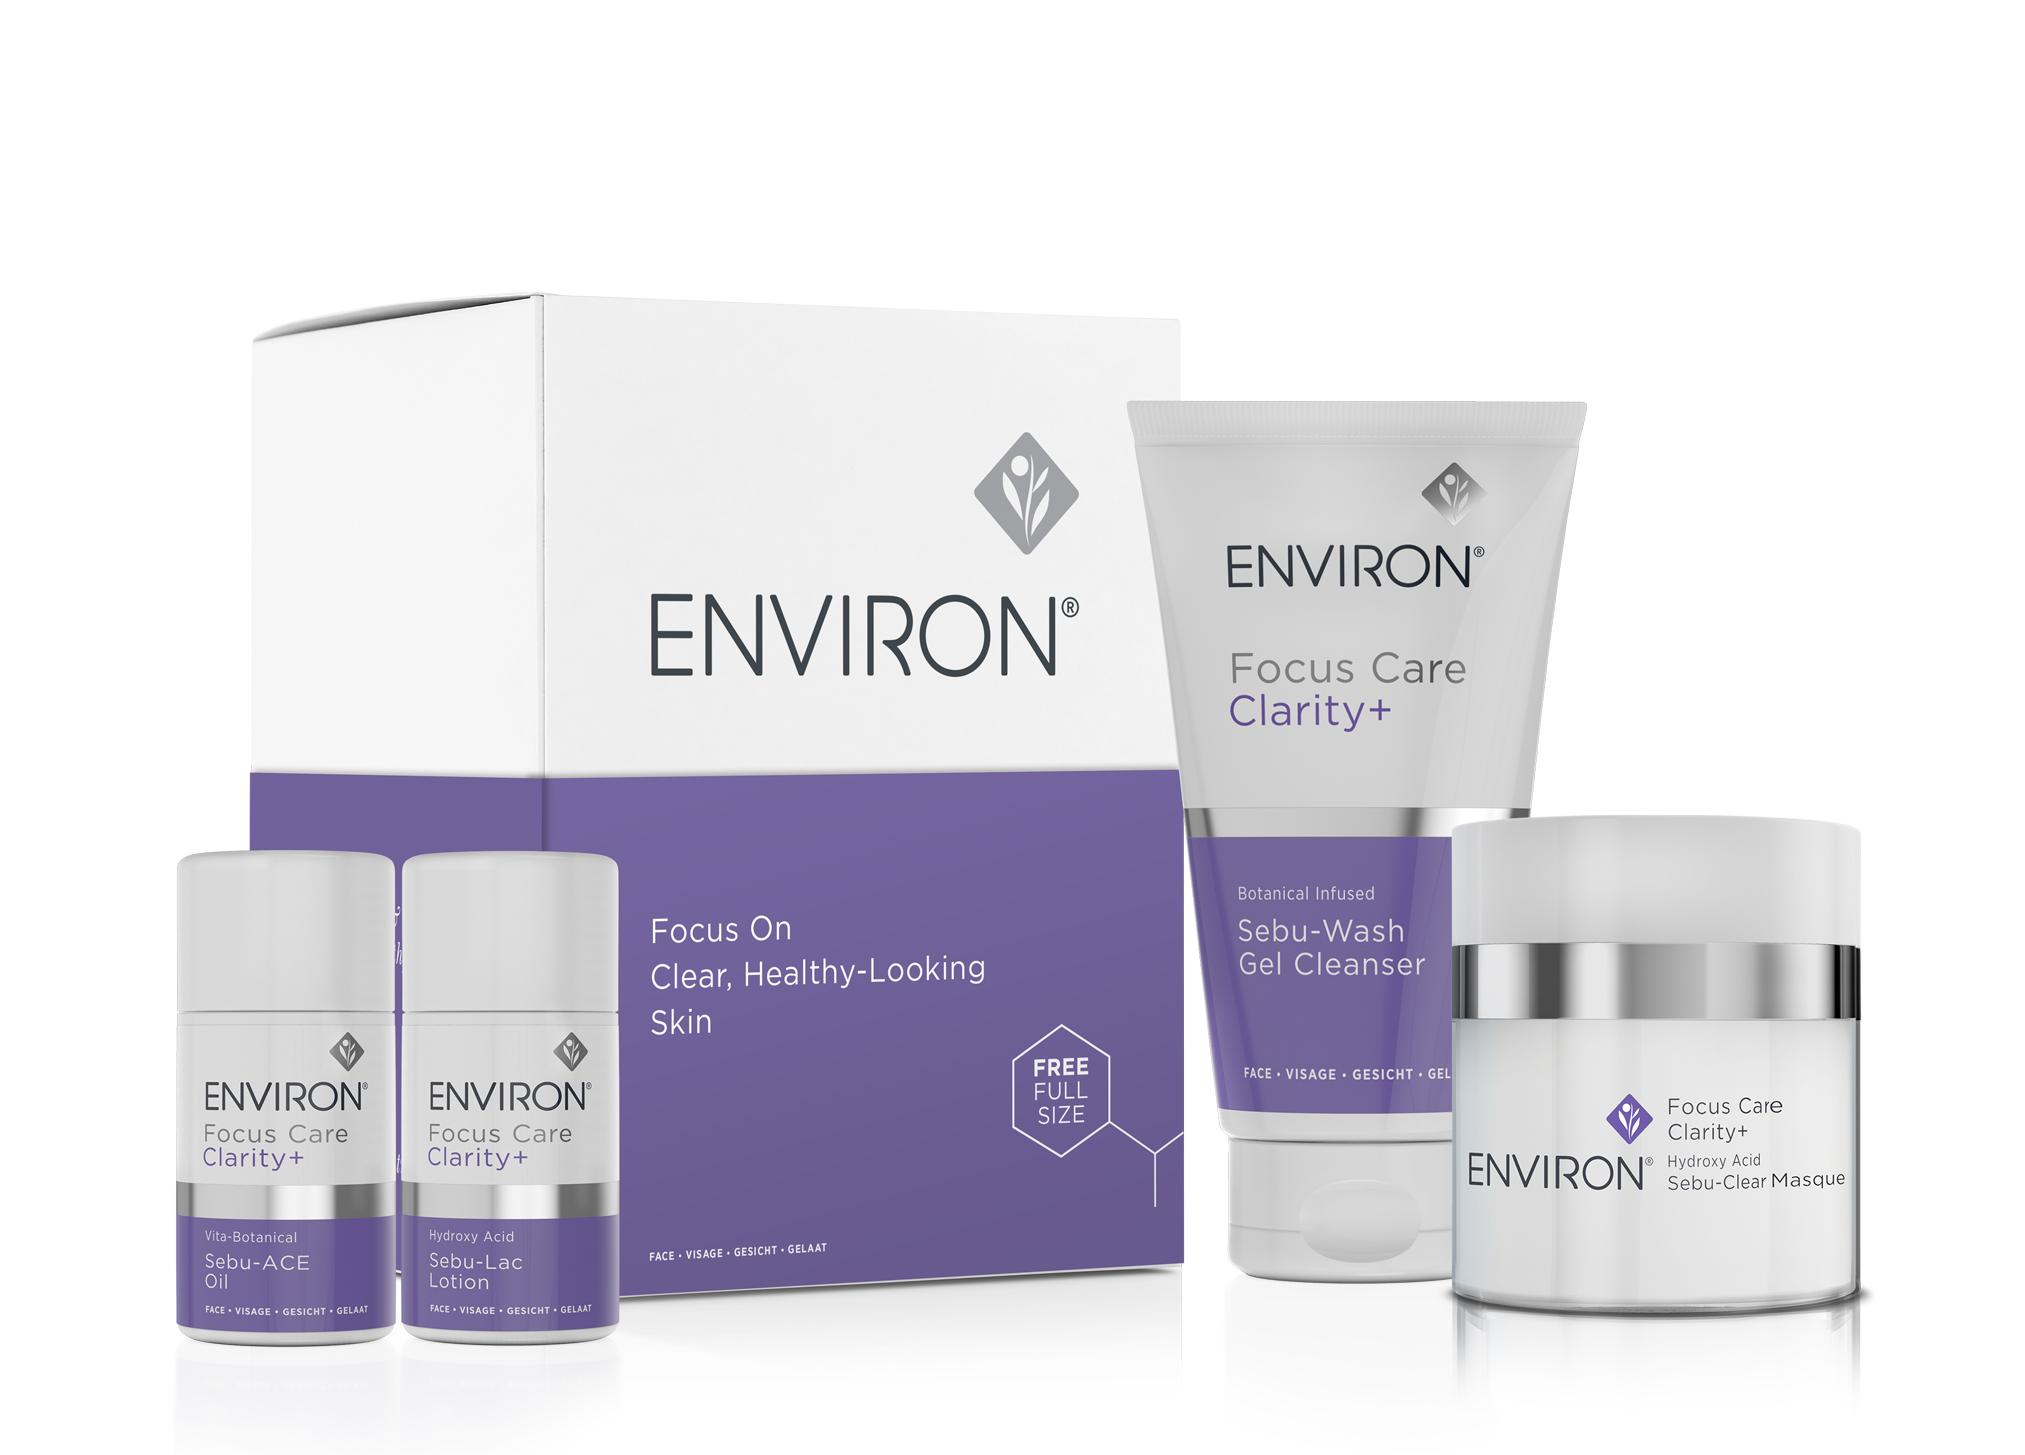 ENVIRON: FOCUS ON CLEAR, HEALTHY SKIN